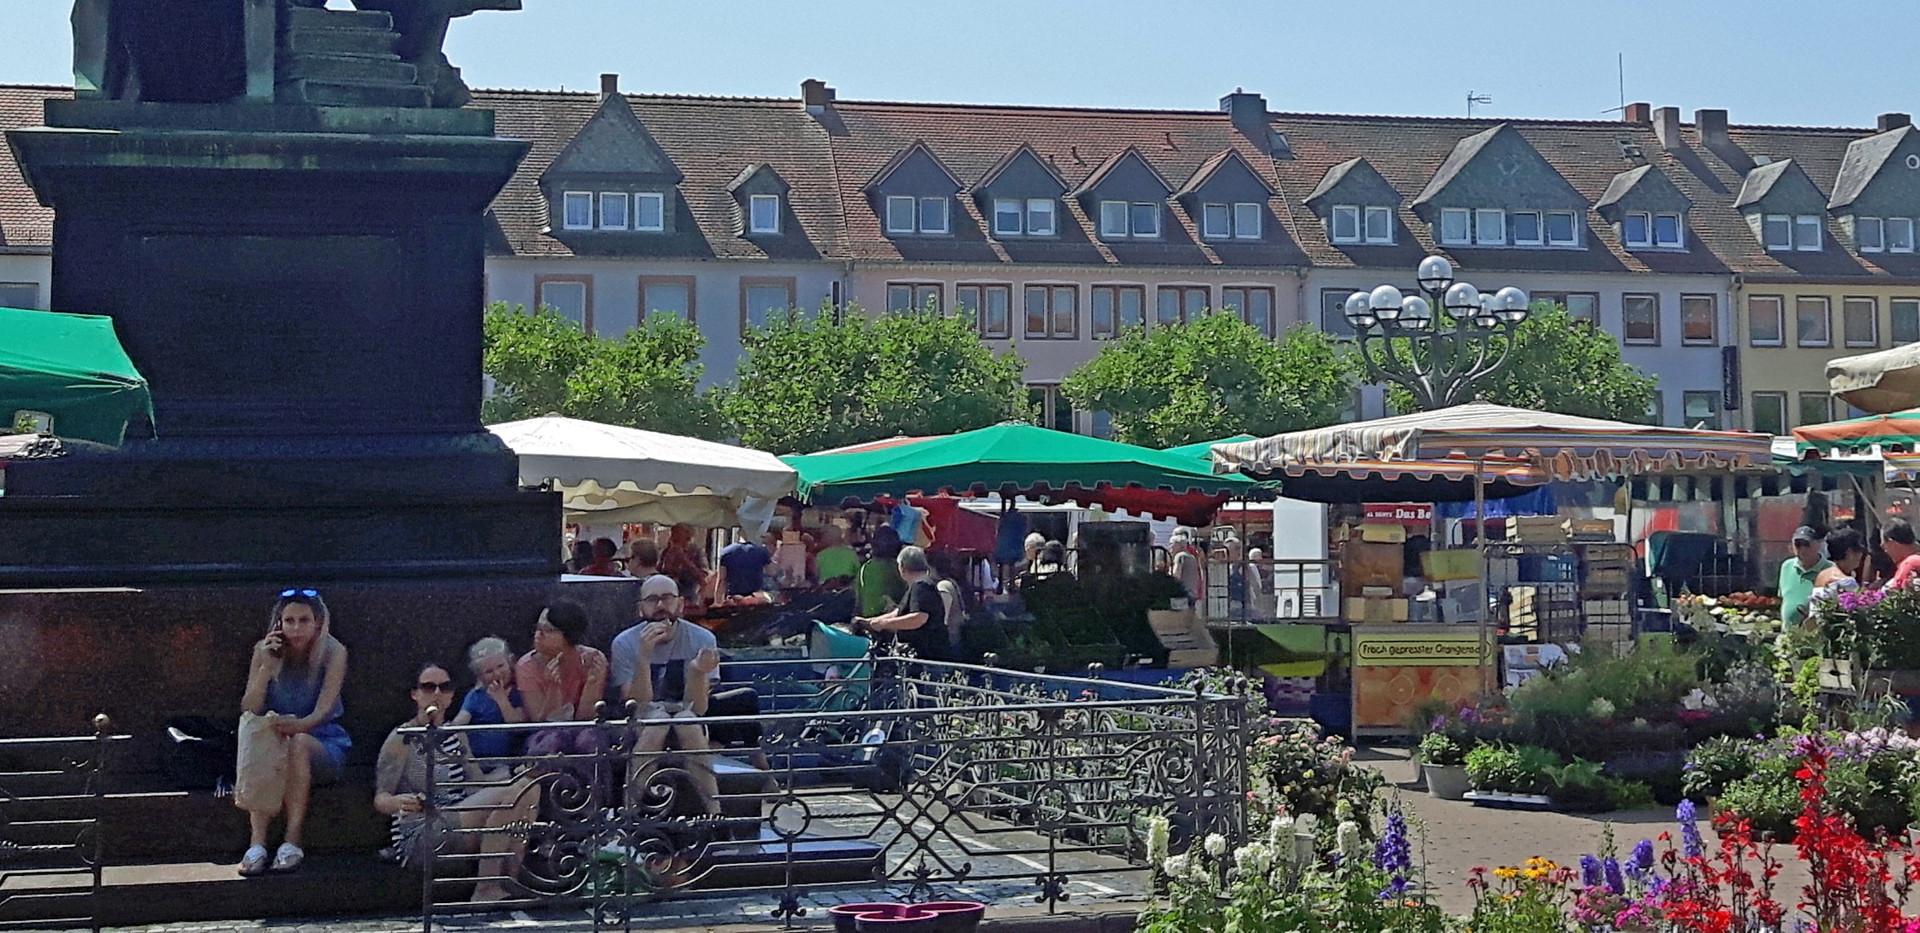 Hanau_Marktplatz_S%C3%BCdseite_edited.jp